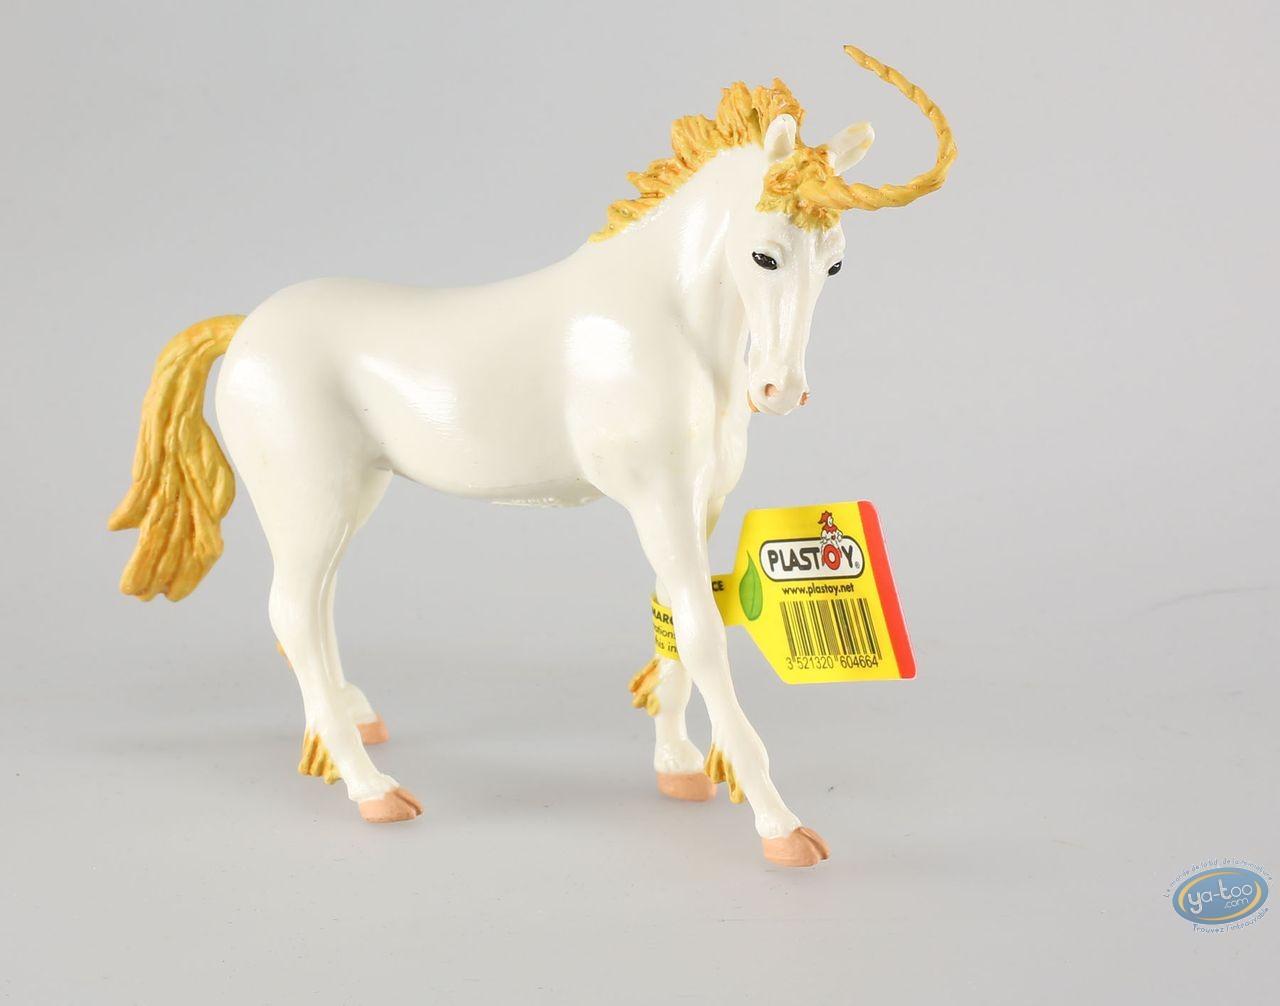 Plastic Figurine, Il Etait une Fois : The unicorn